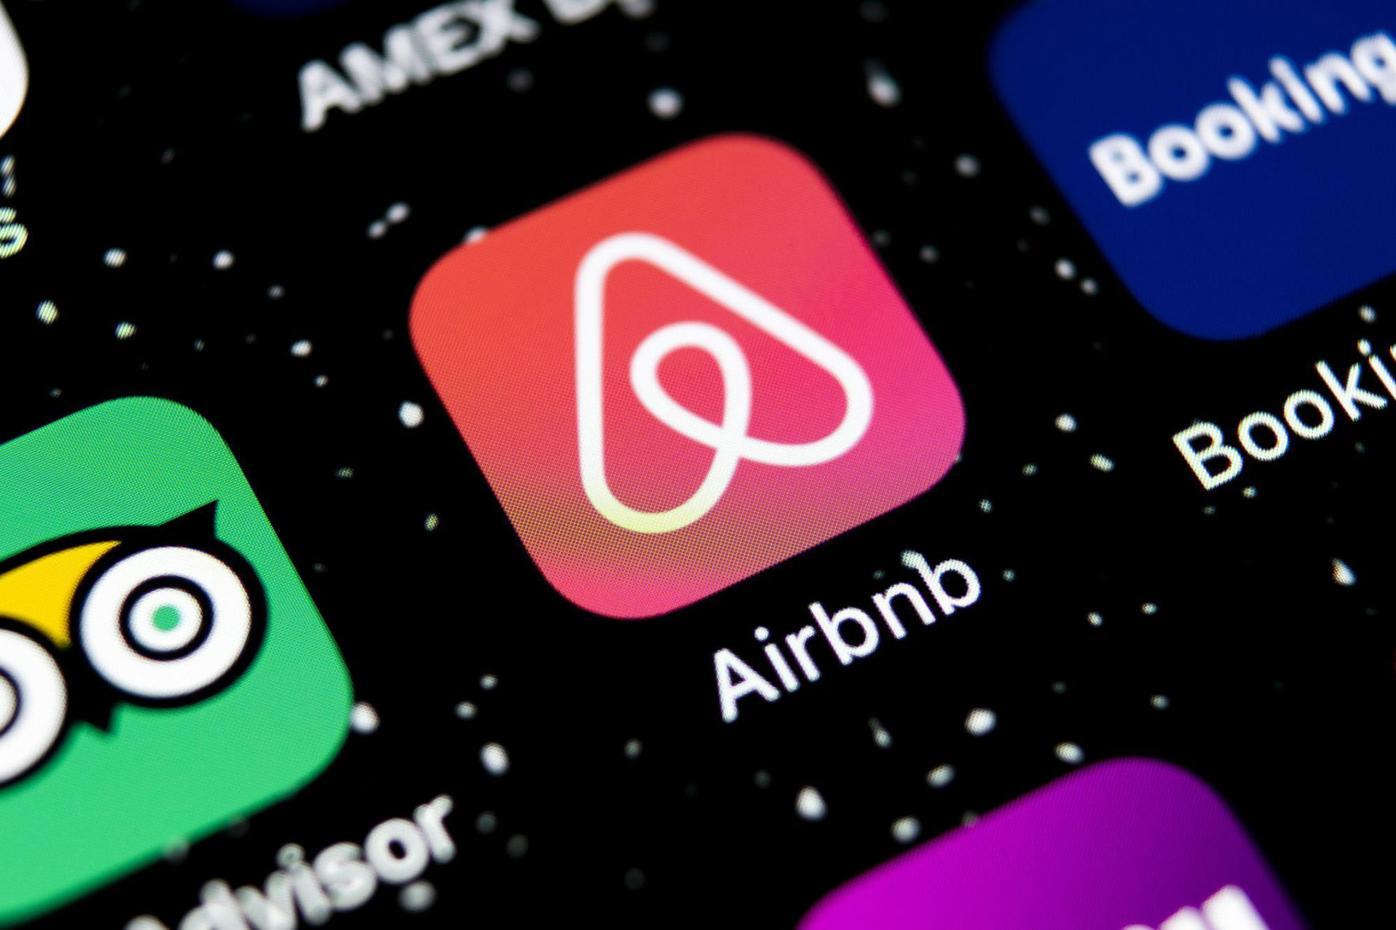 Airbnb (copy)